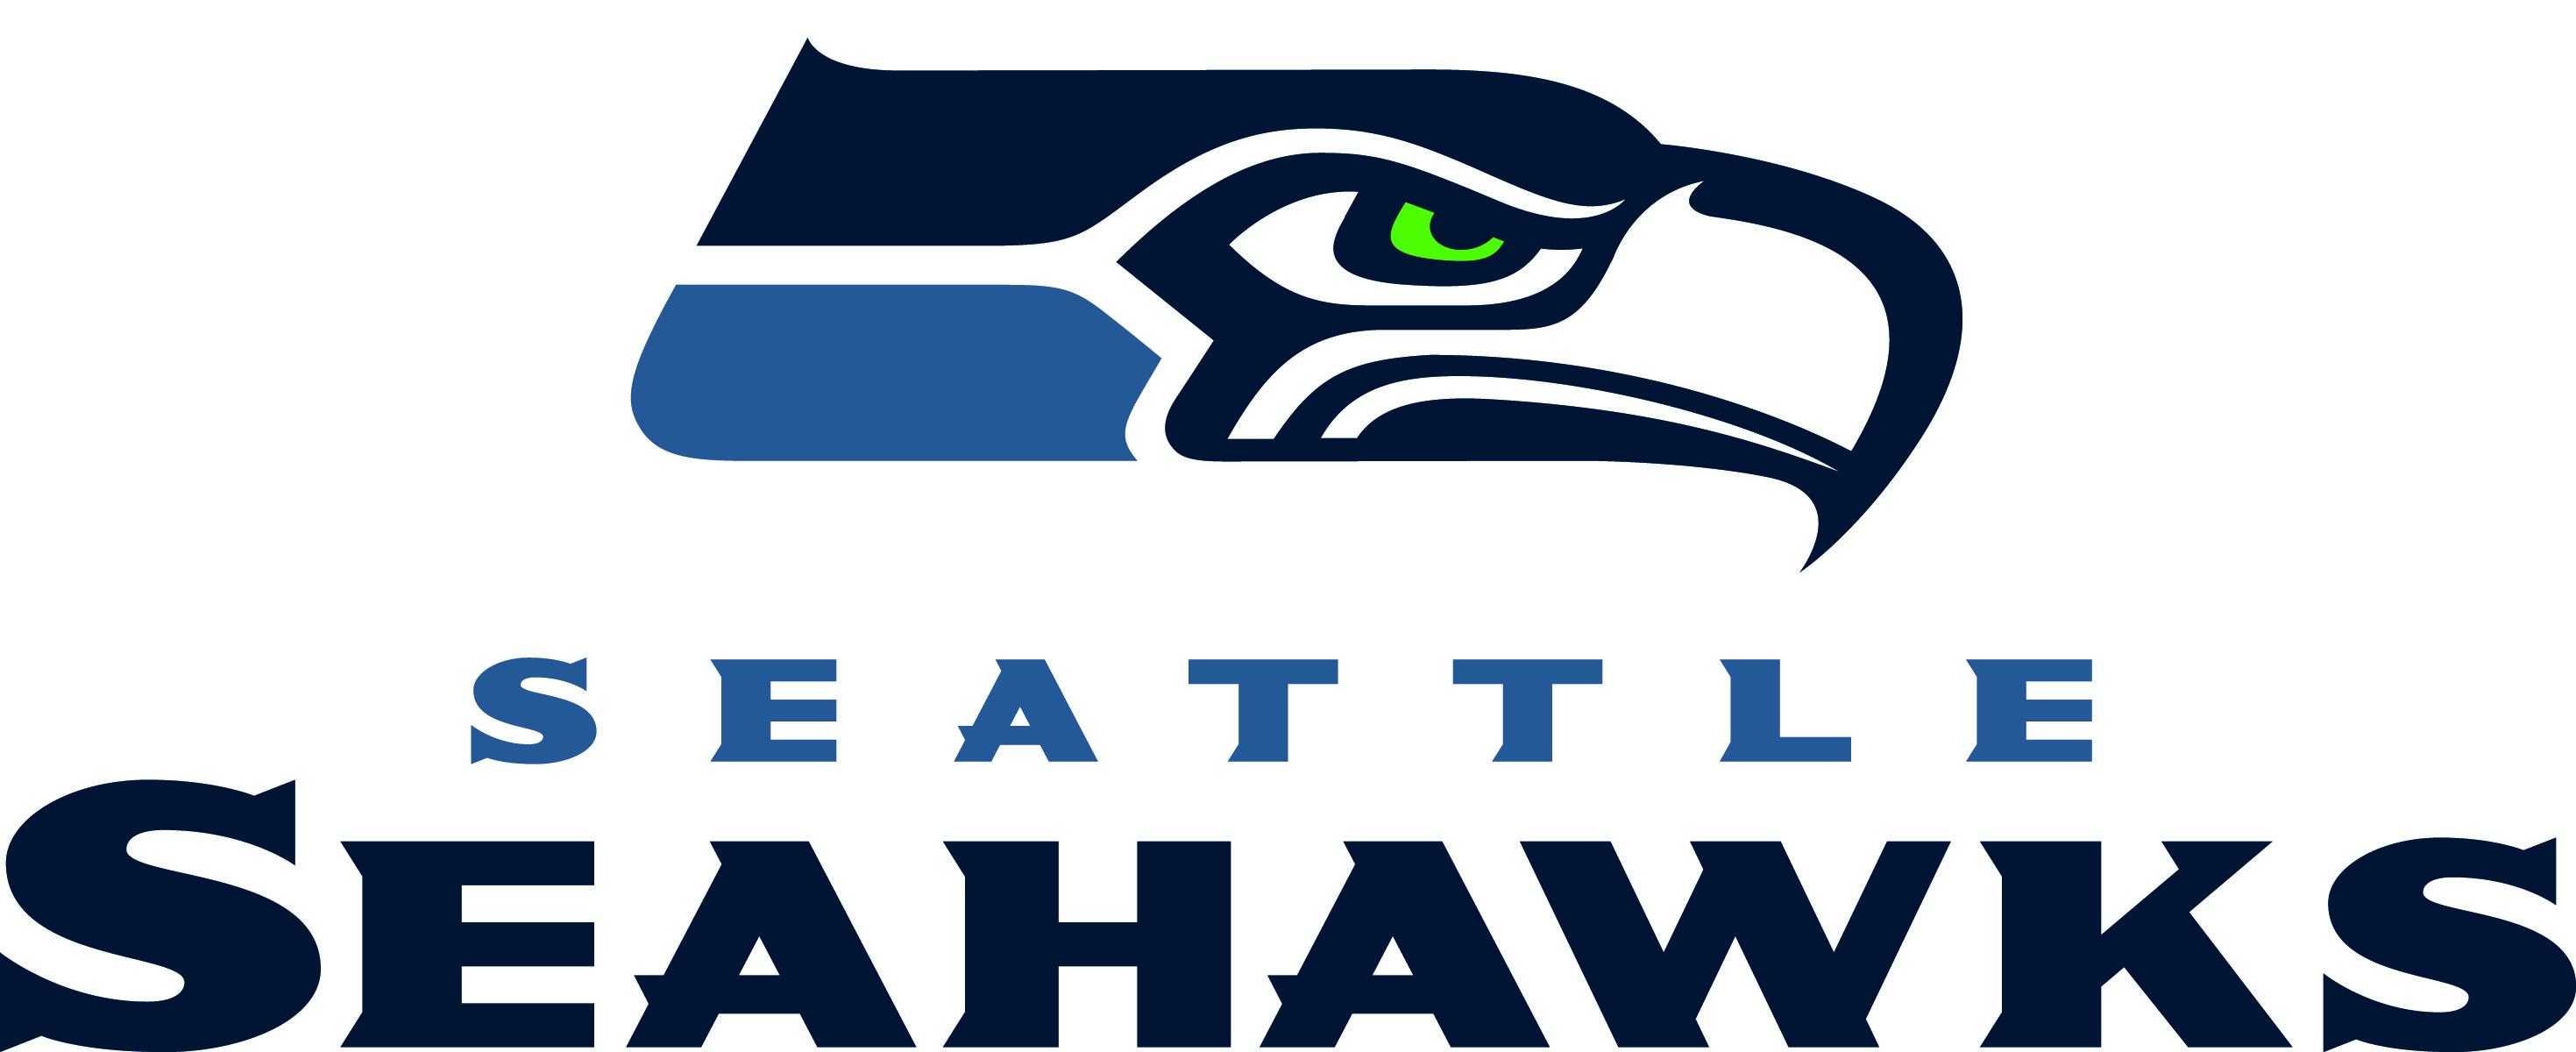 Free Seattle Seahawks, Download Free Clip Art, Free Clip Art on.